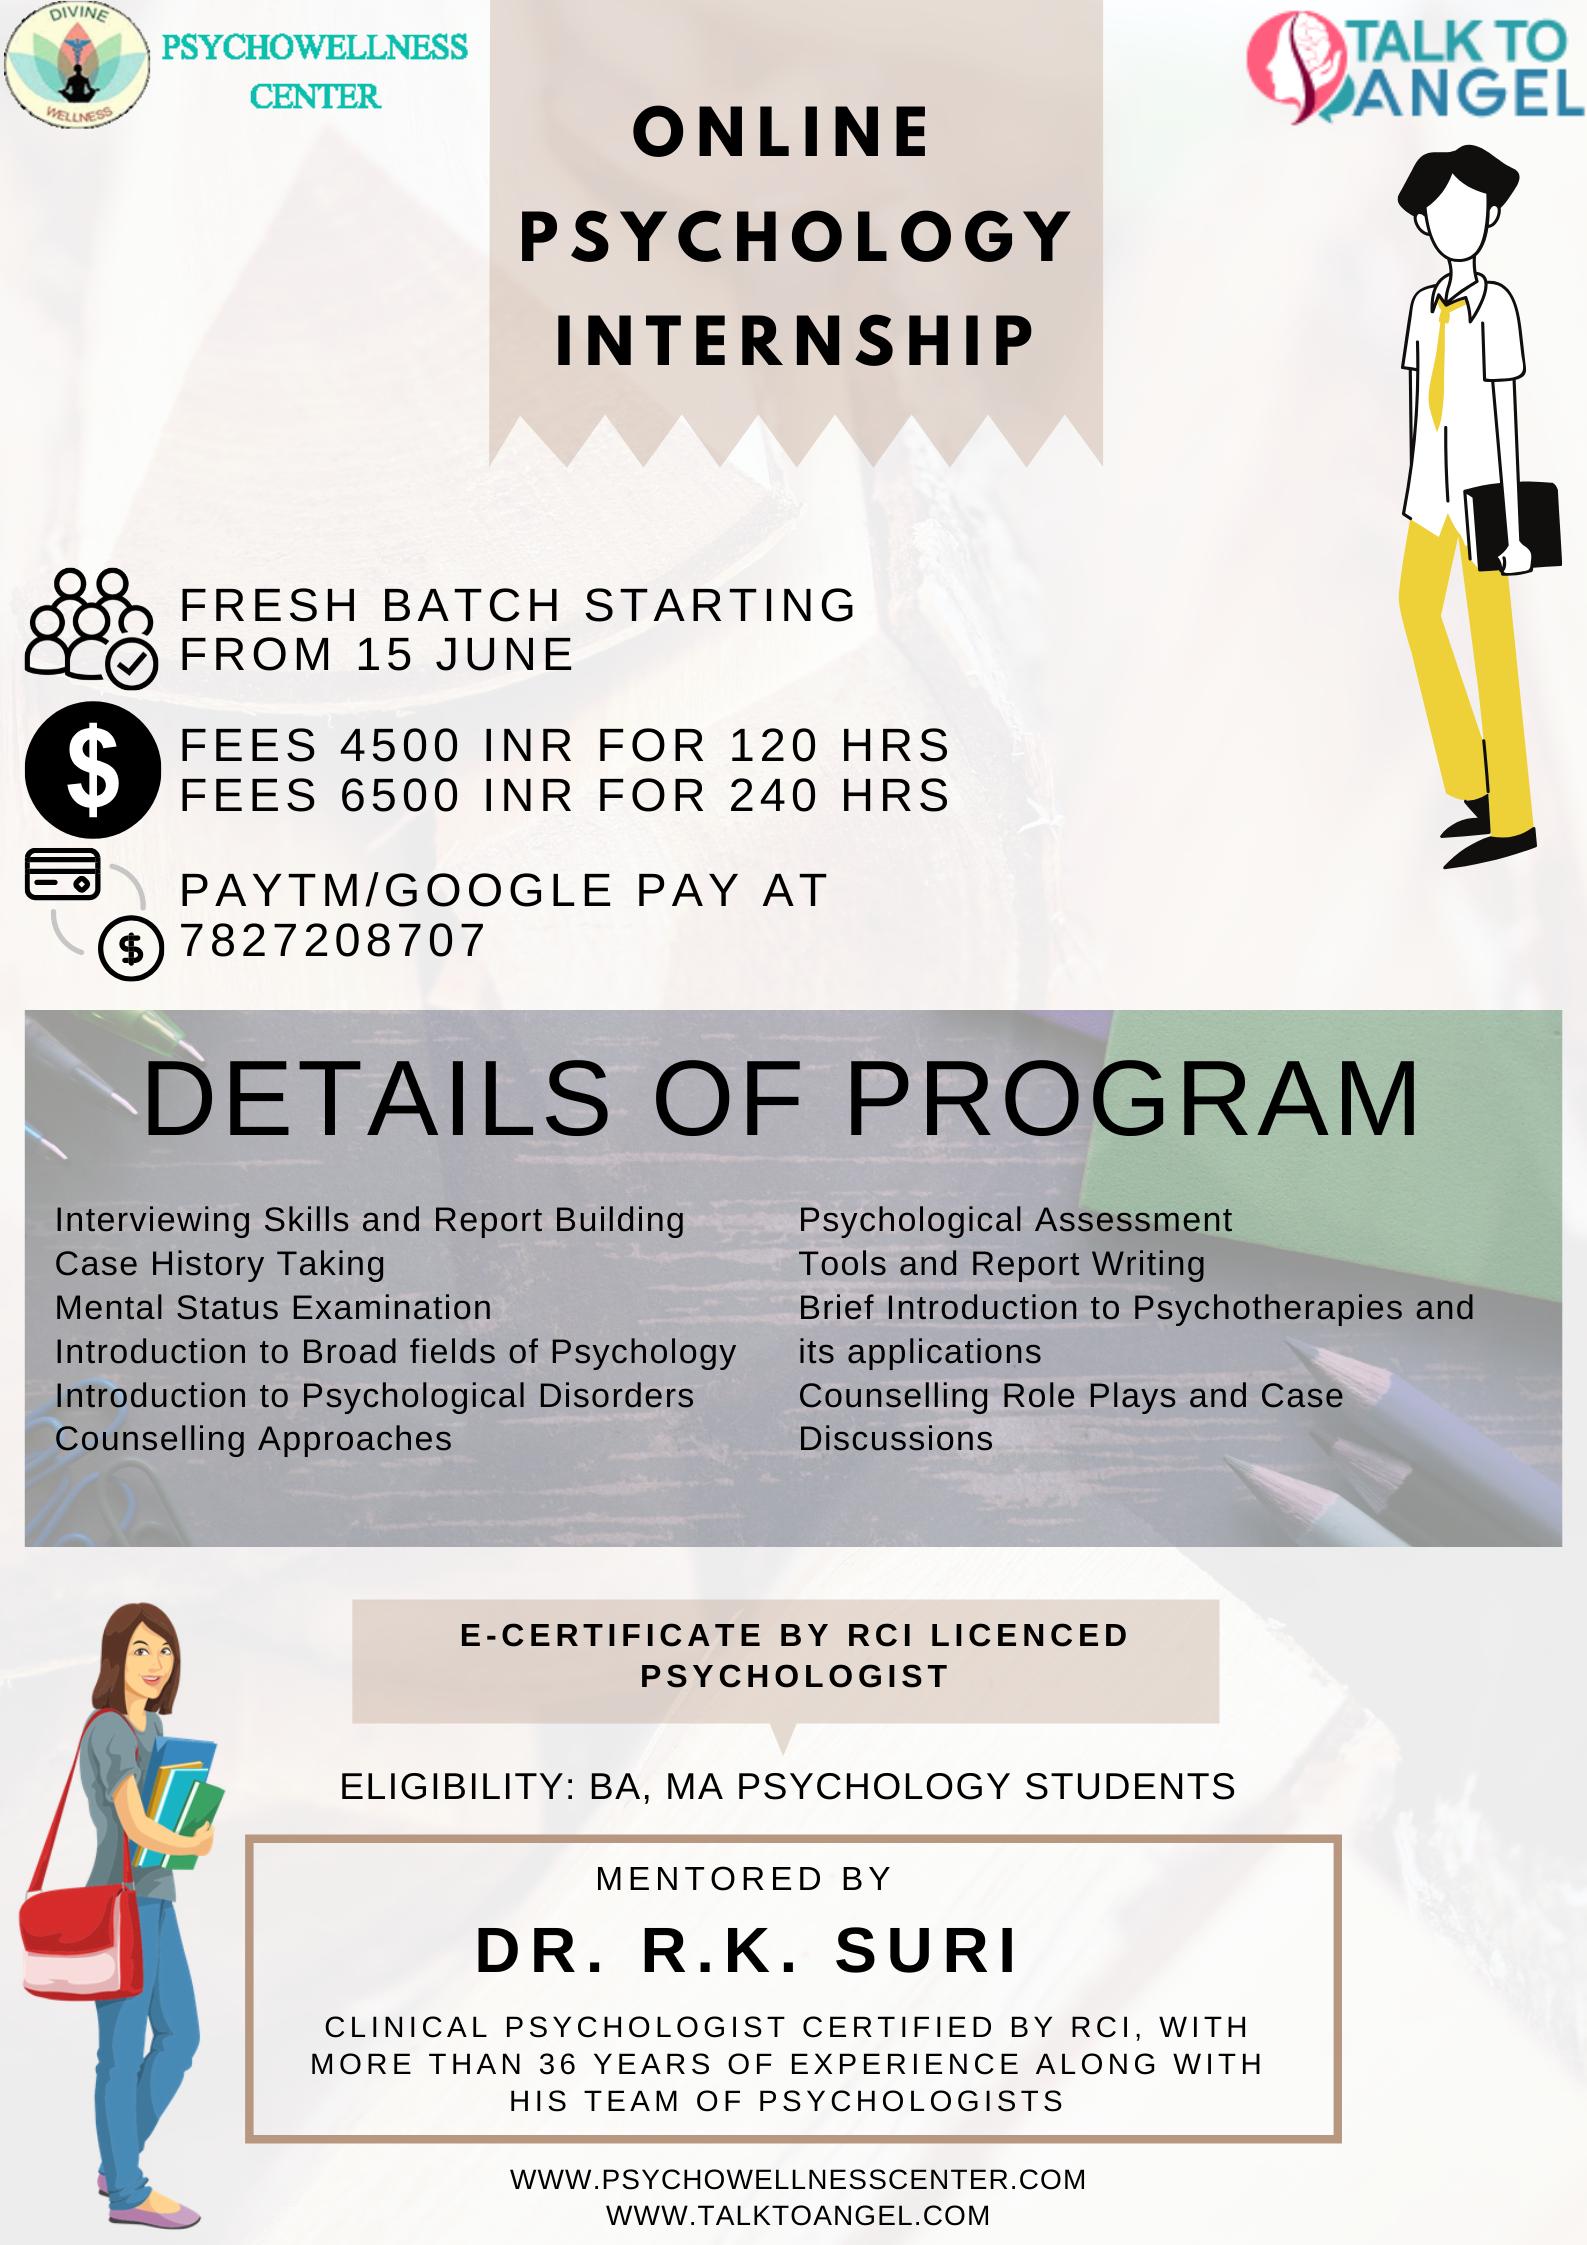 Online Psychology Internship In 2020 Psychology Student Internship Program Online Therapy